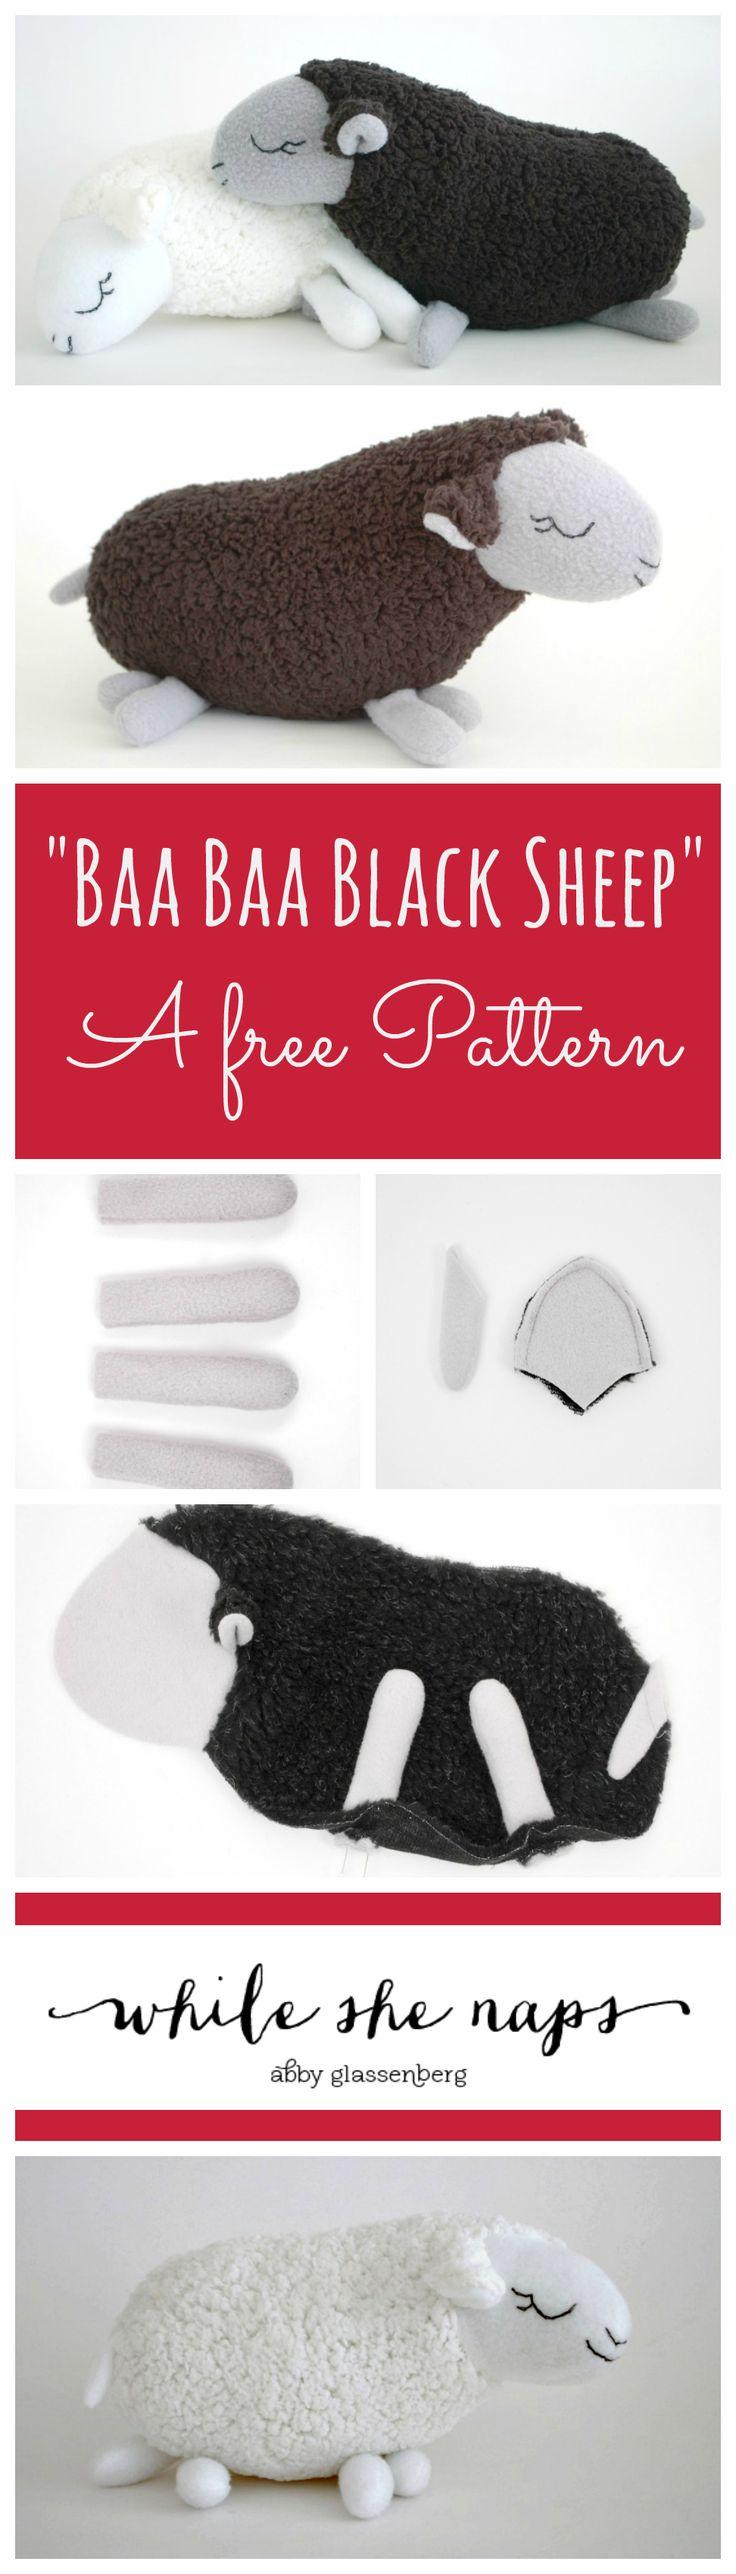 Free Pattern Baa Baa Black Sheep and